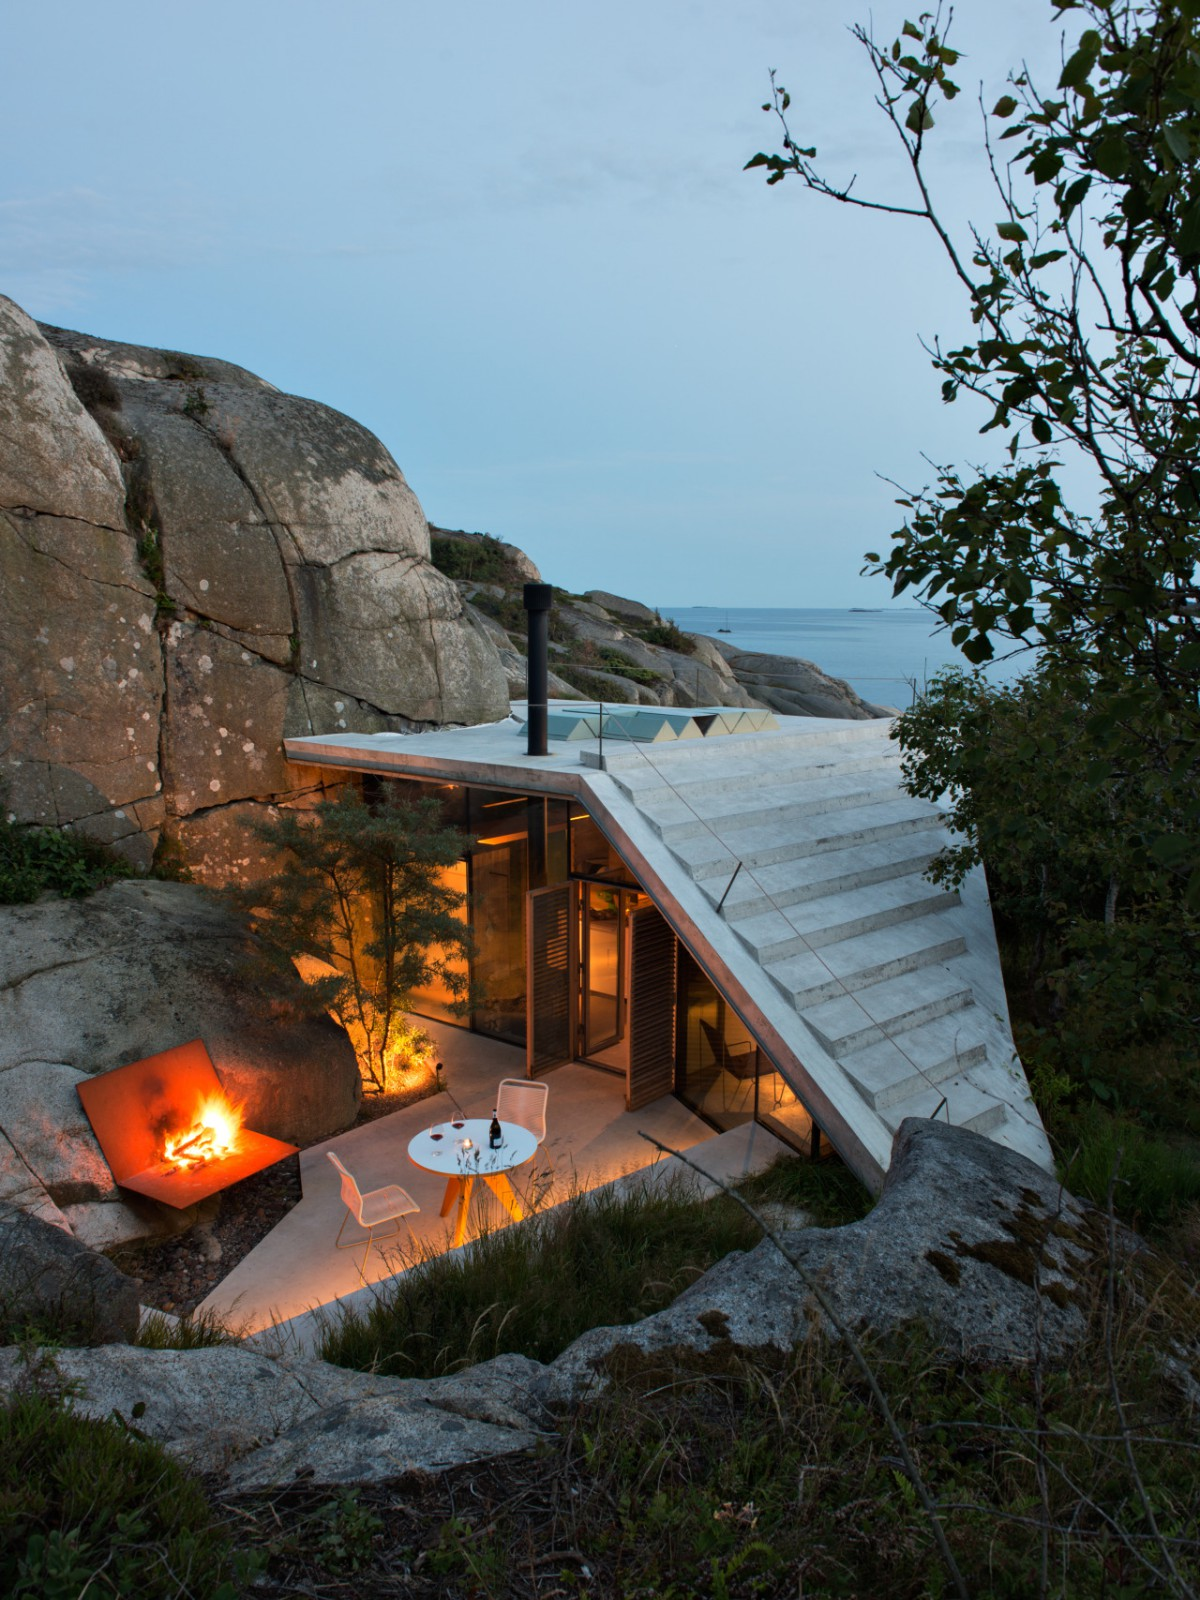 A Modern Cabin Tucked Into A Rocky Norwegian Coastline | Lund Hagem